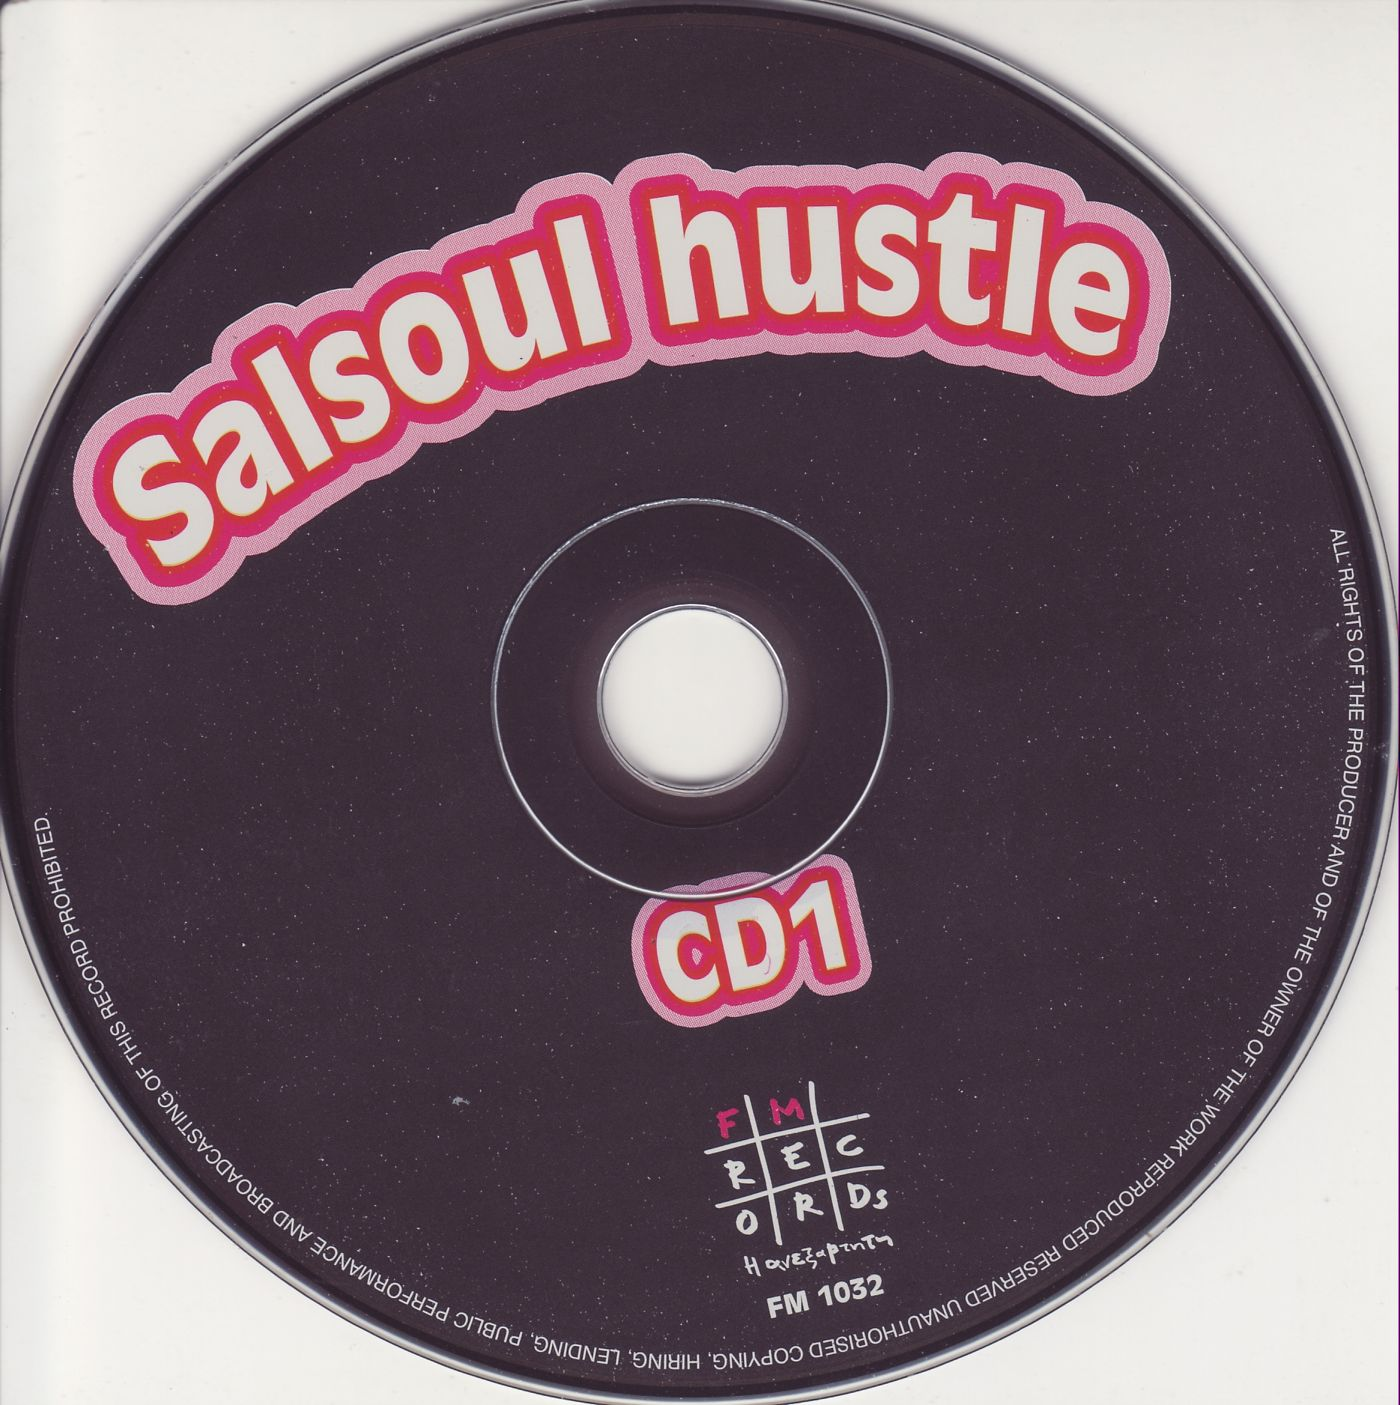 Instant Funk Greatest Hits : Disco go va salsoul hustle dance classics